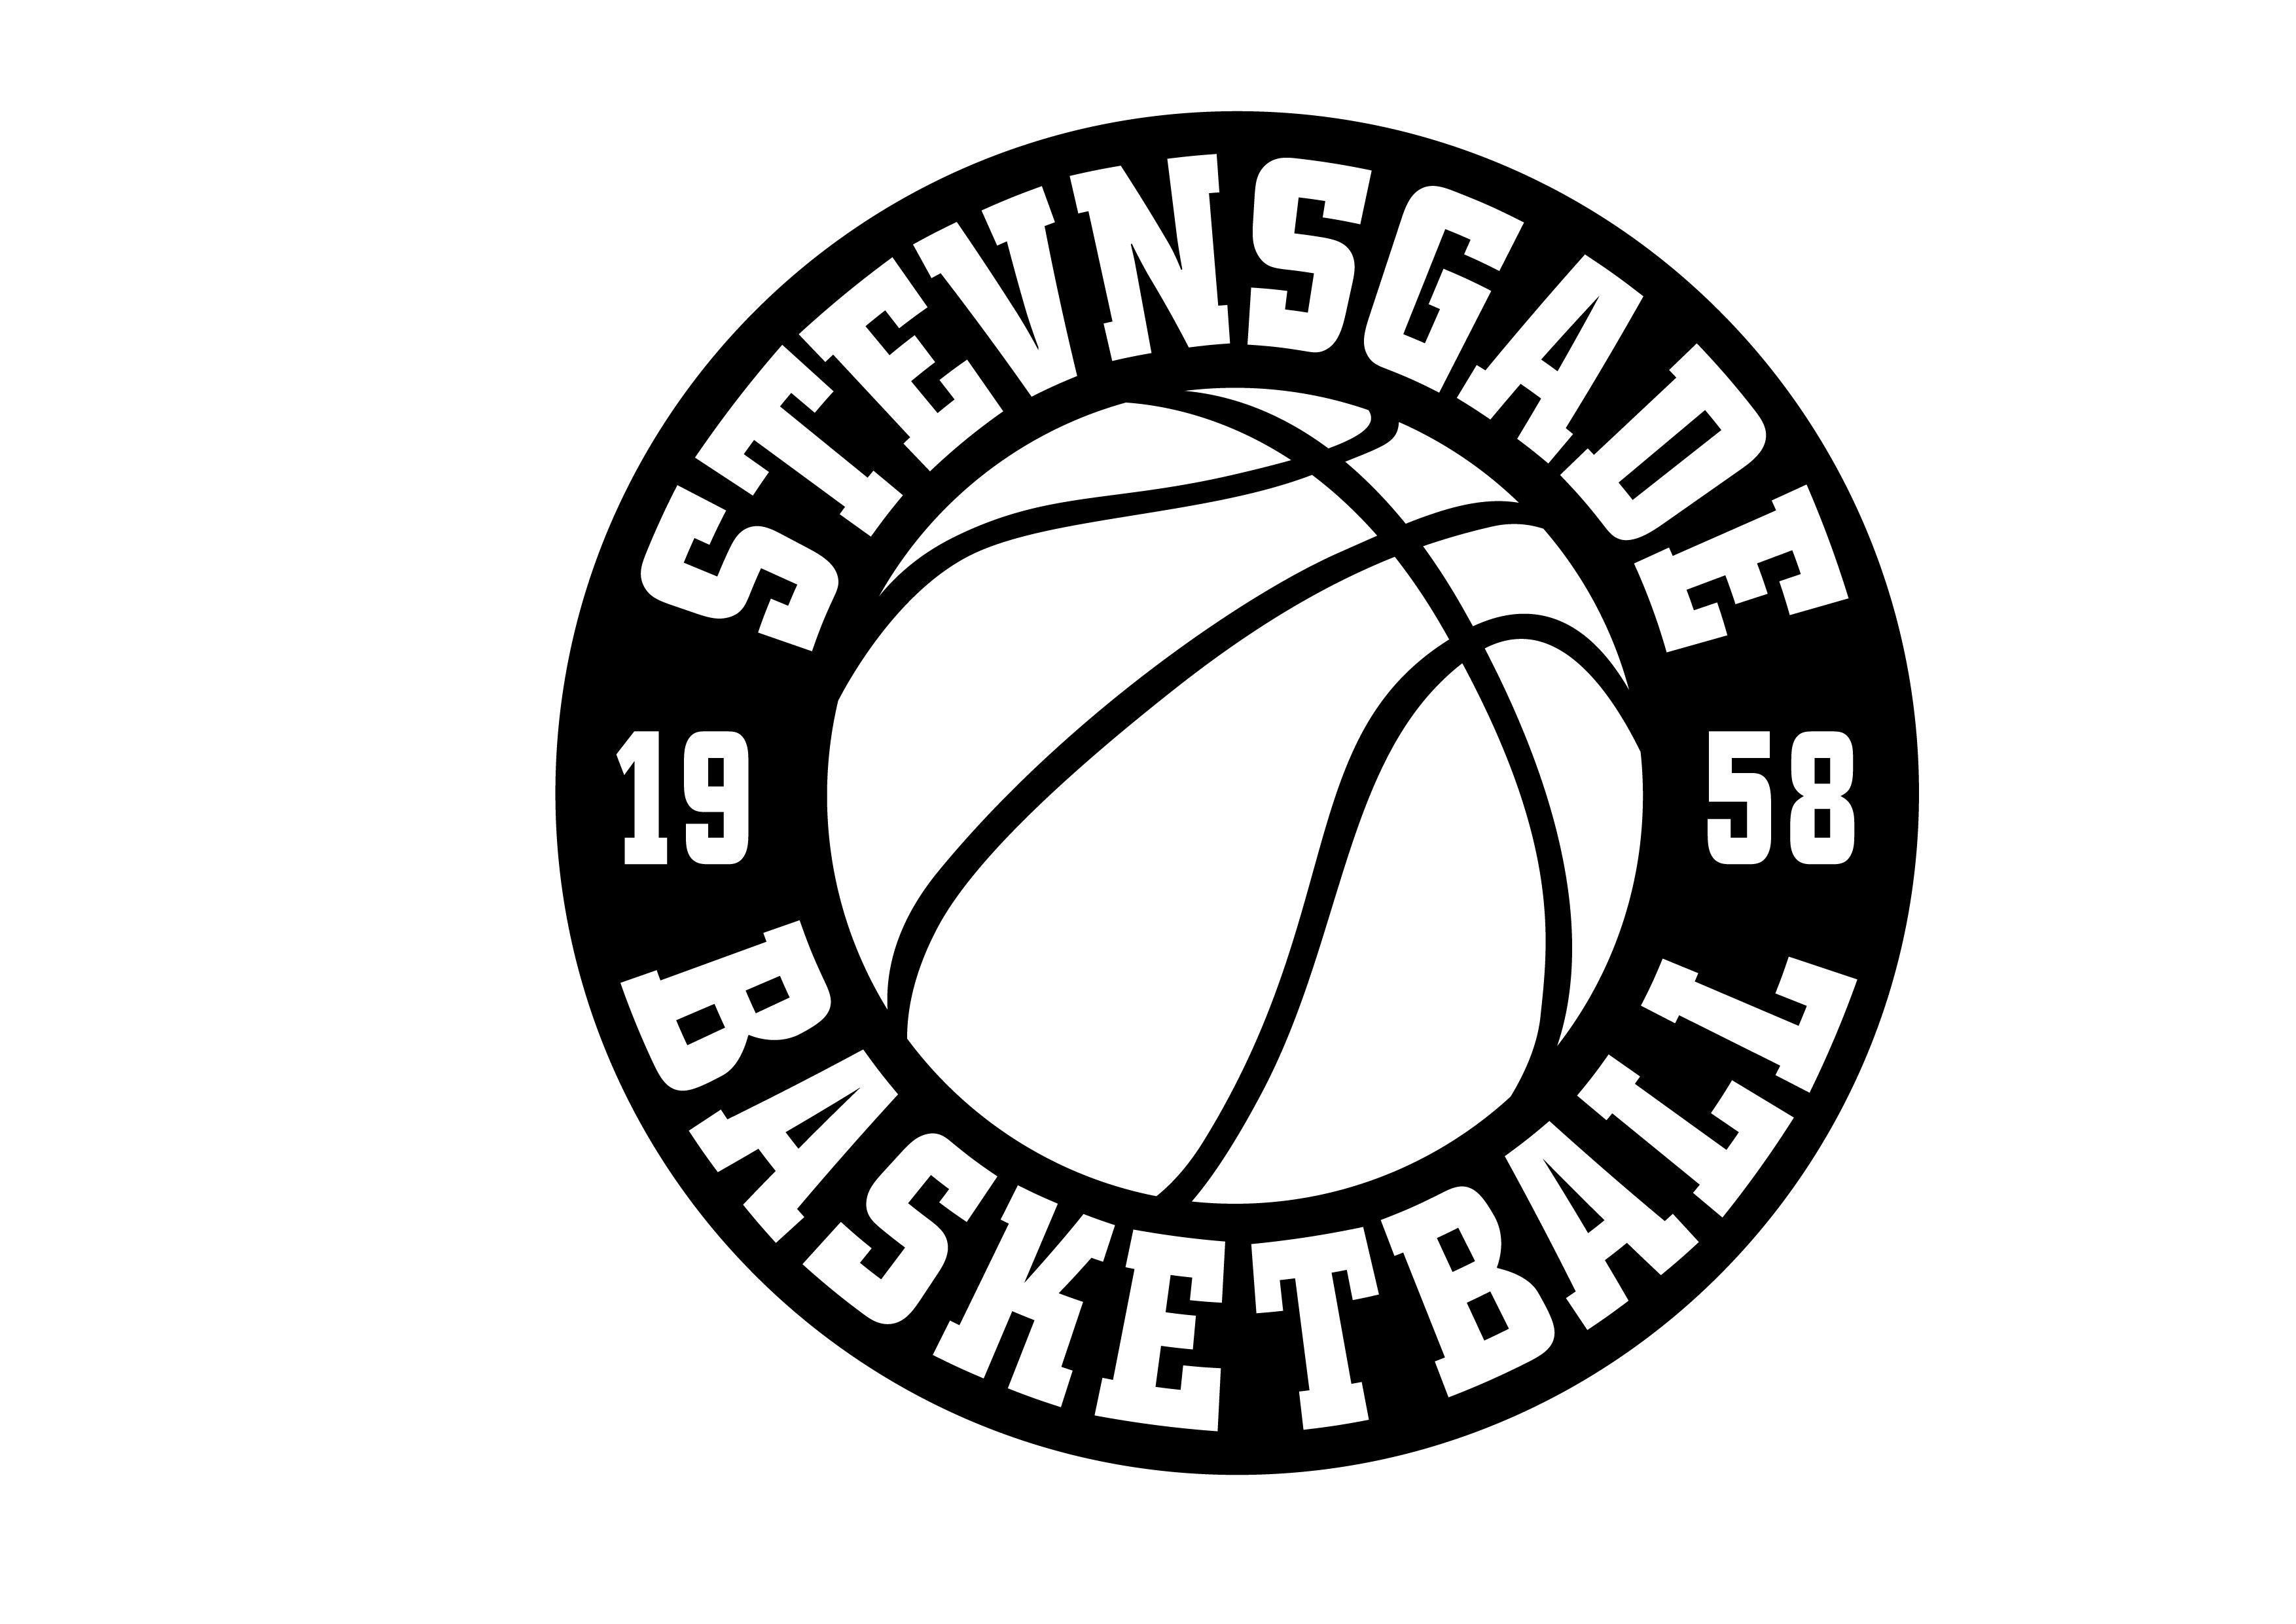 34e8aa6e307a Stevnsgade Basketshop - STEVNSGADE FANSHOP